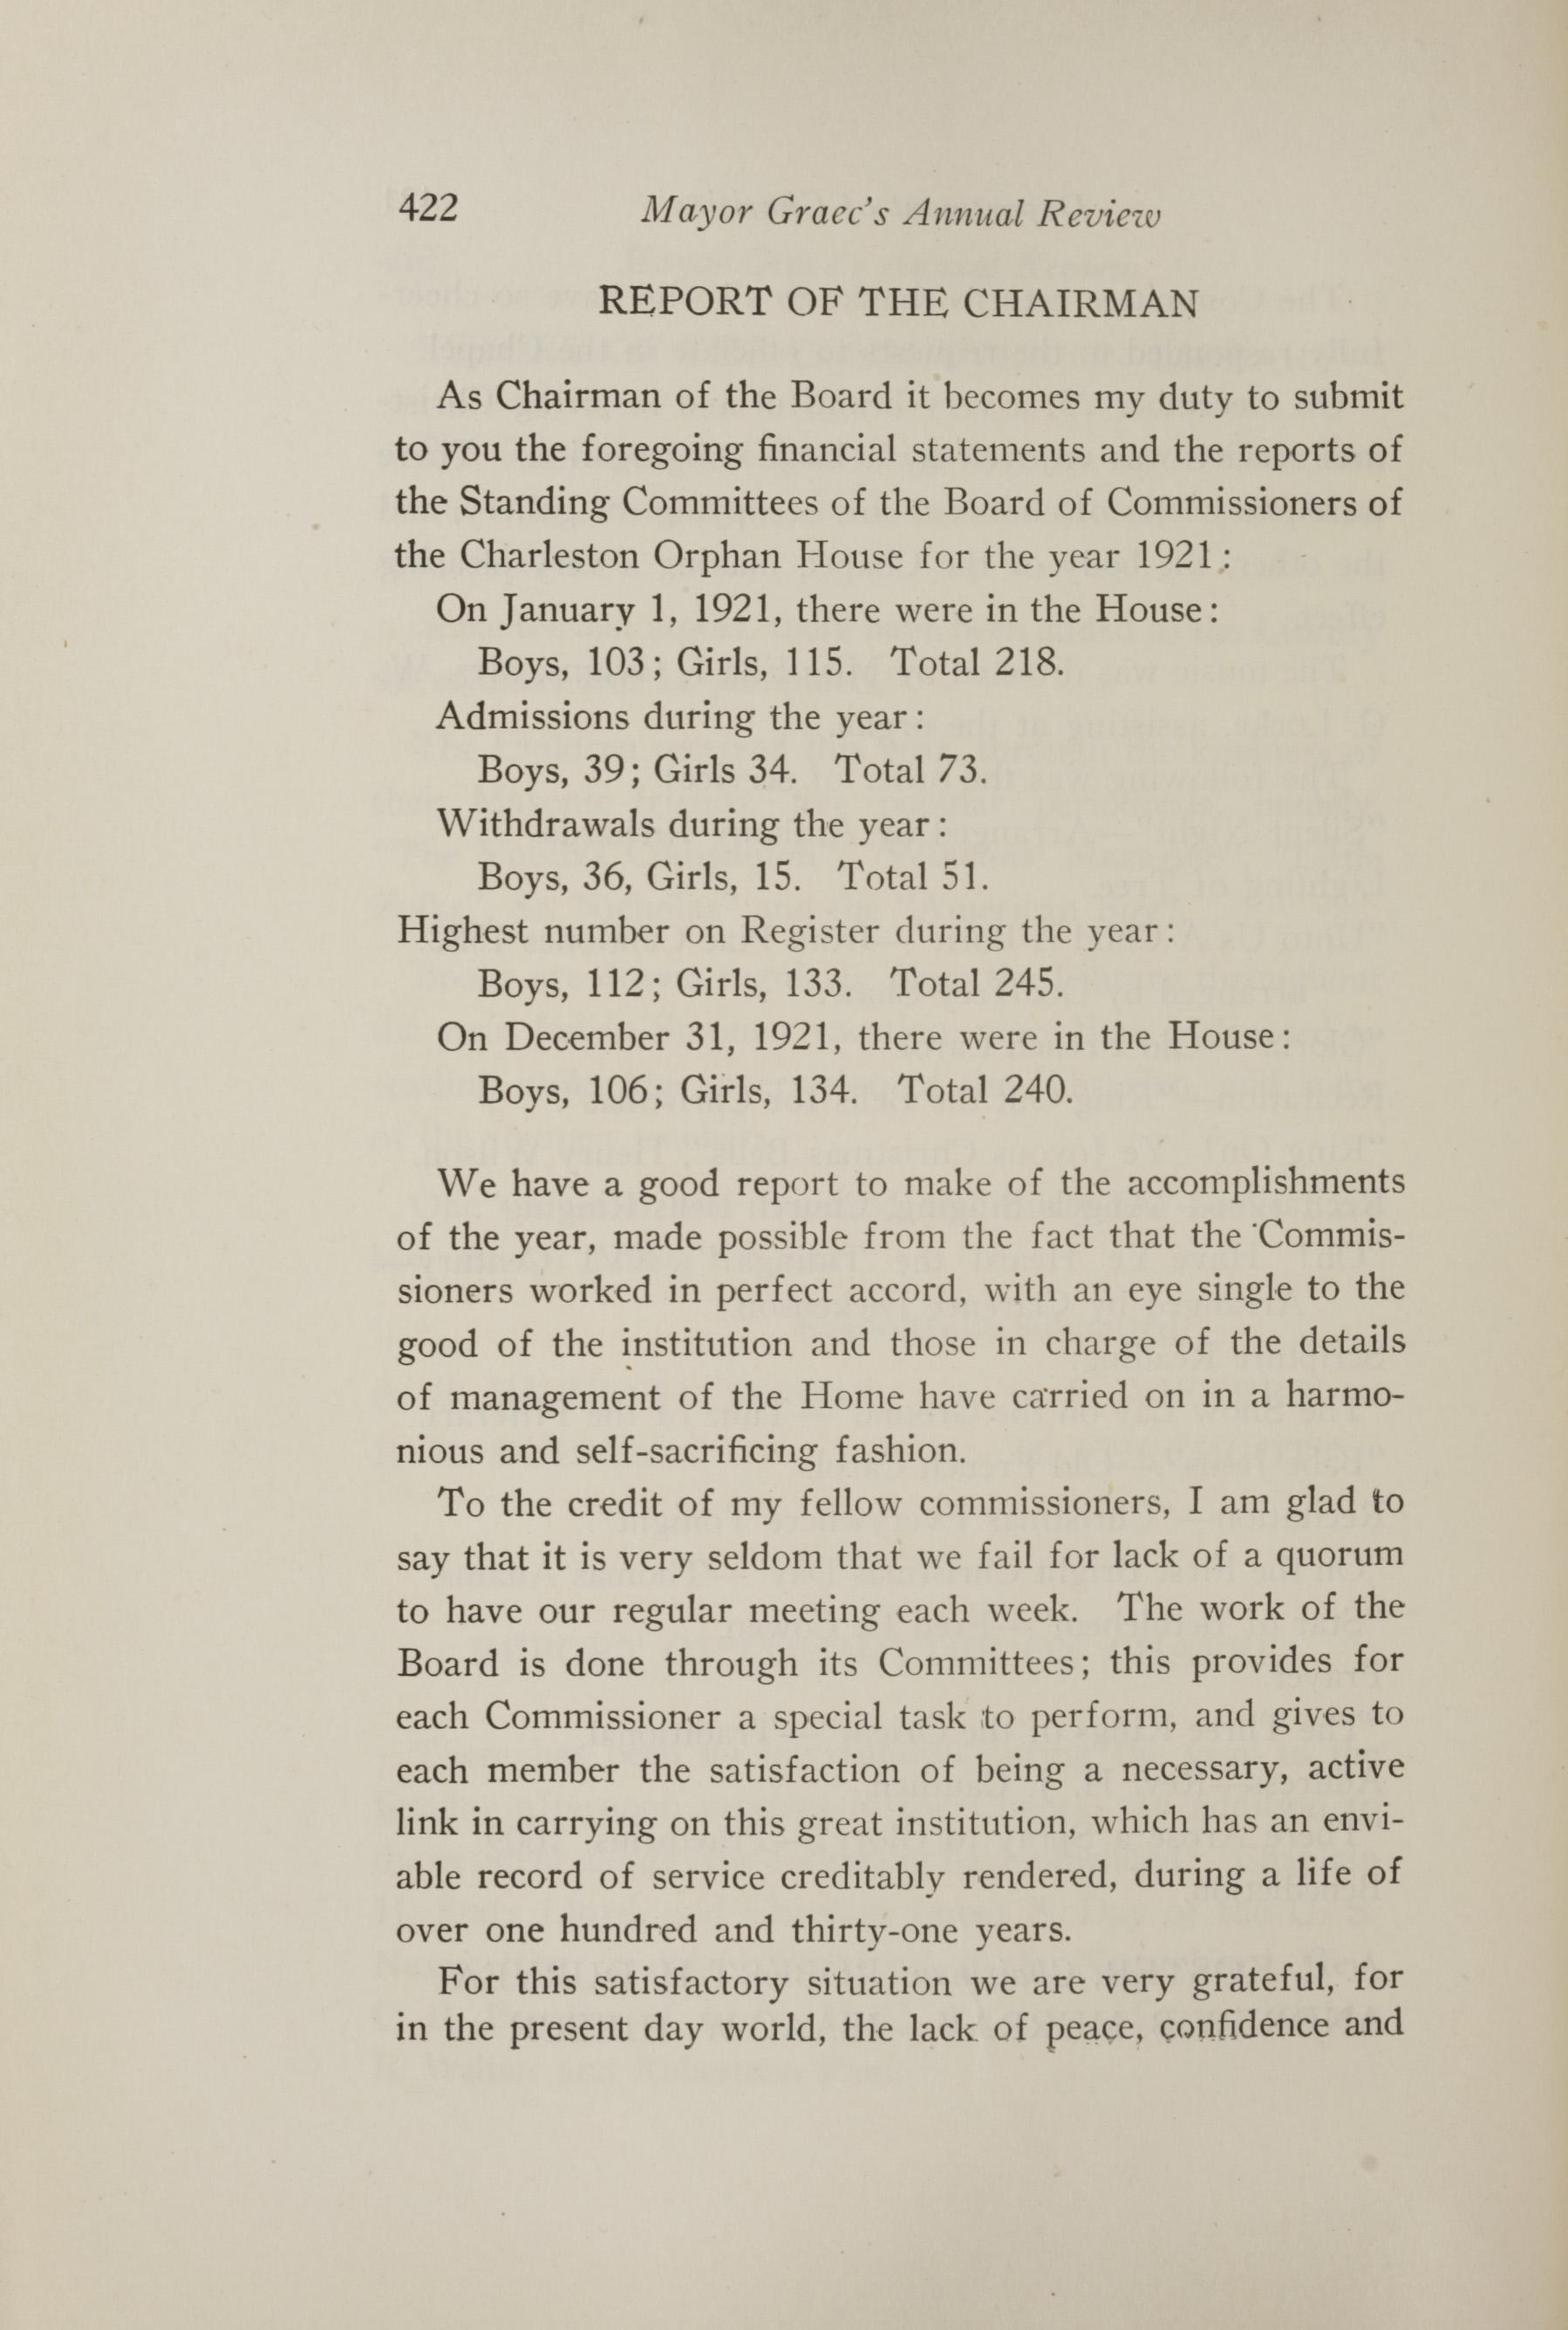 Charleston Yearbook, 1921, page 422